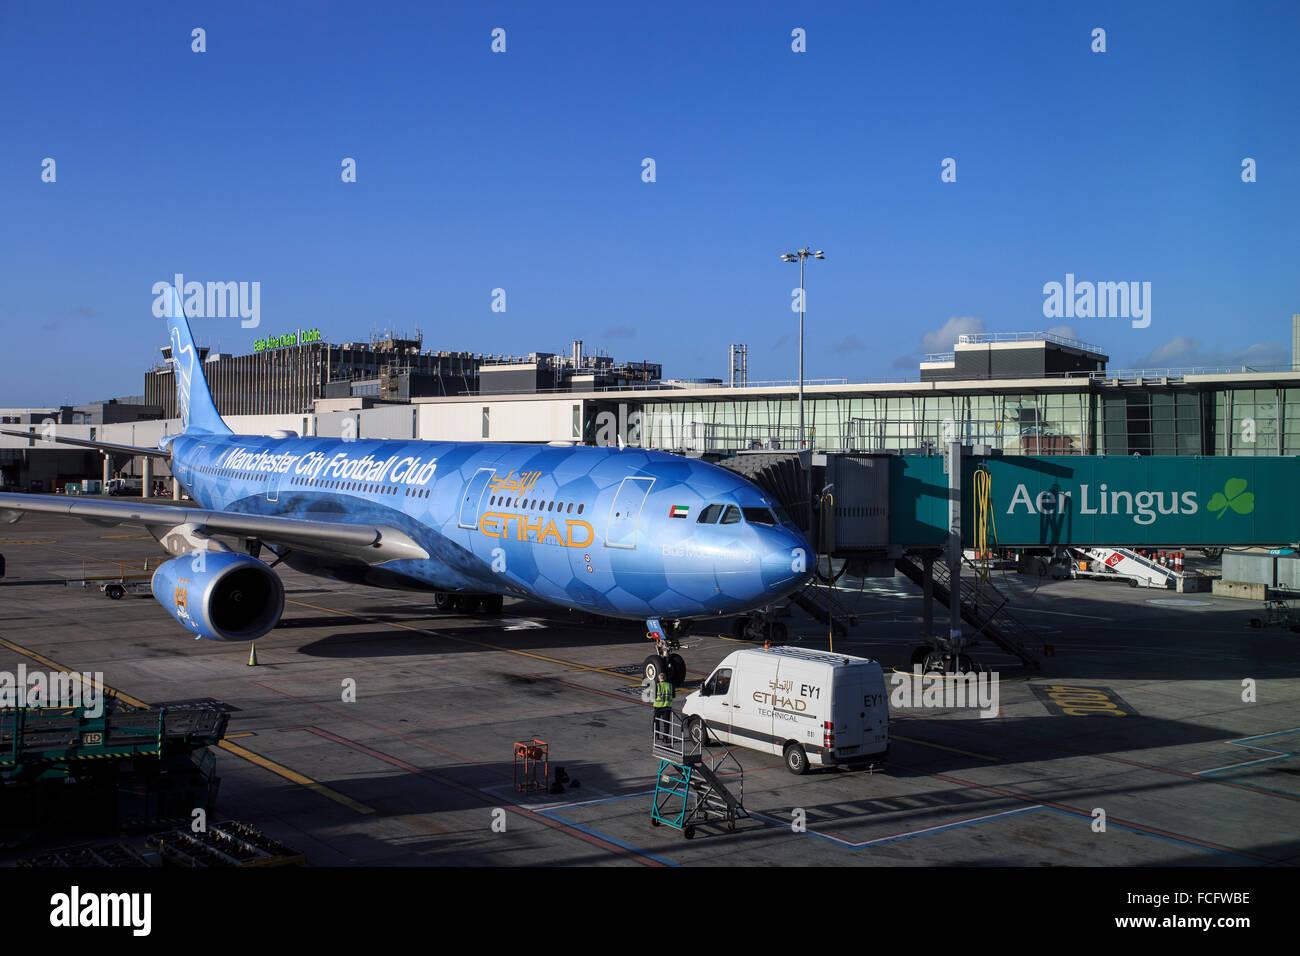 etihad air aircraft airline plane dublin airport - Stock Image